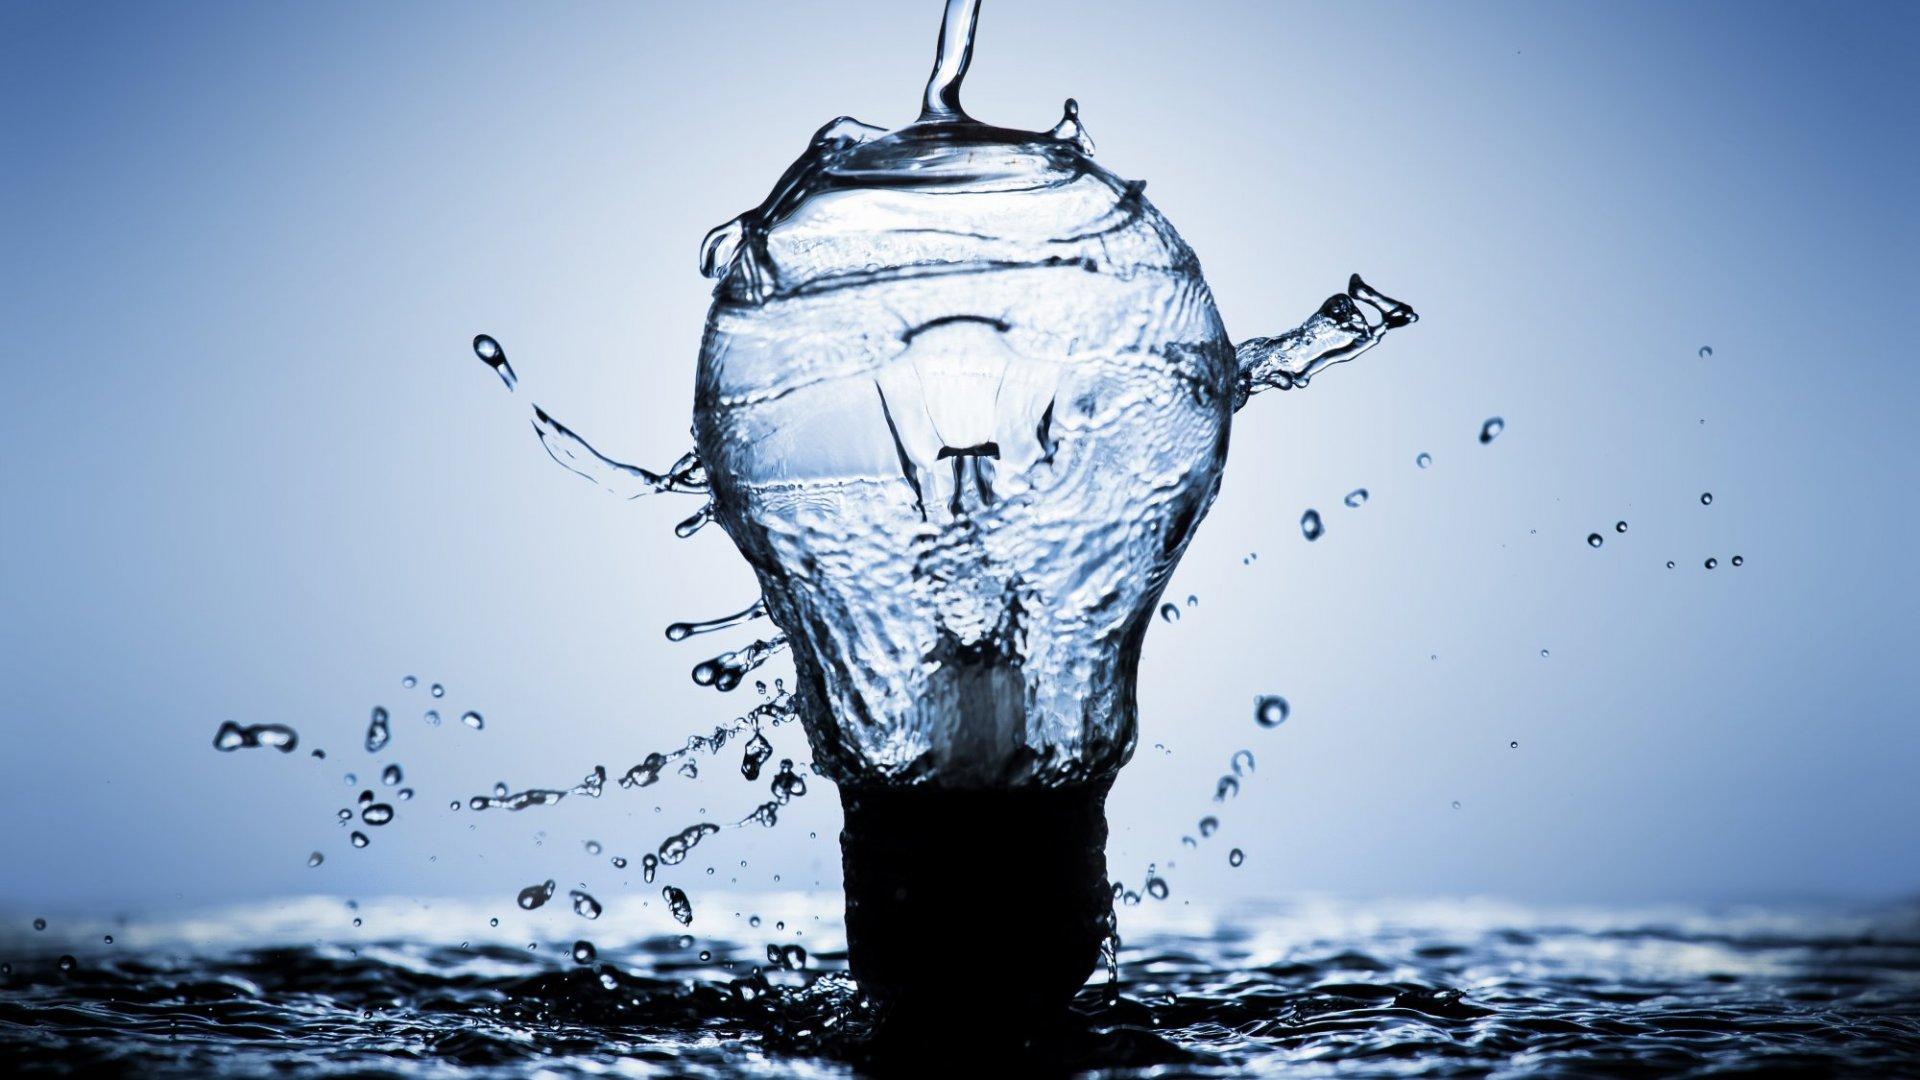 Disrupting a mature market requires more than a great idea.